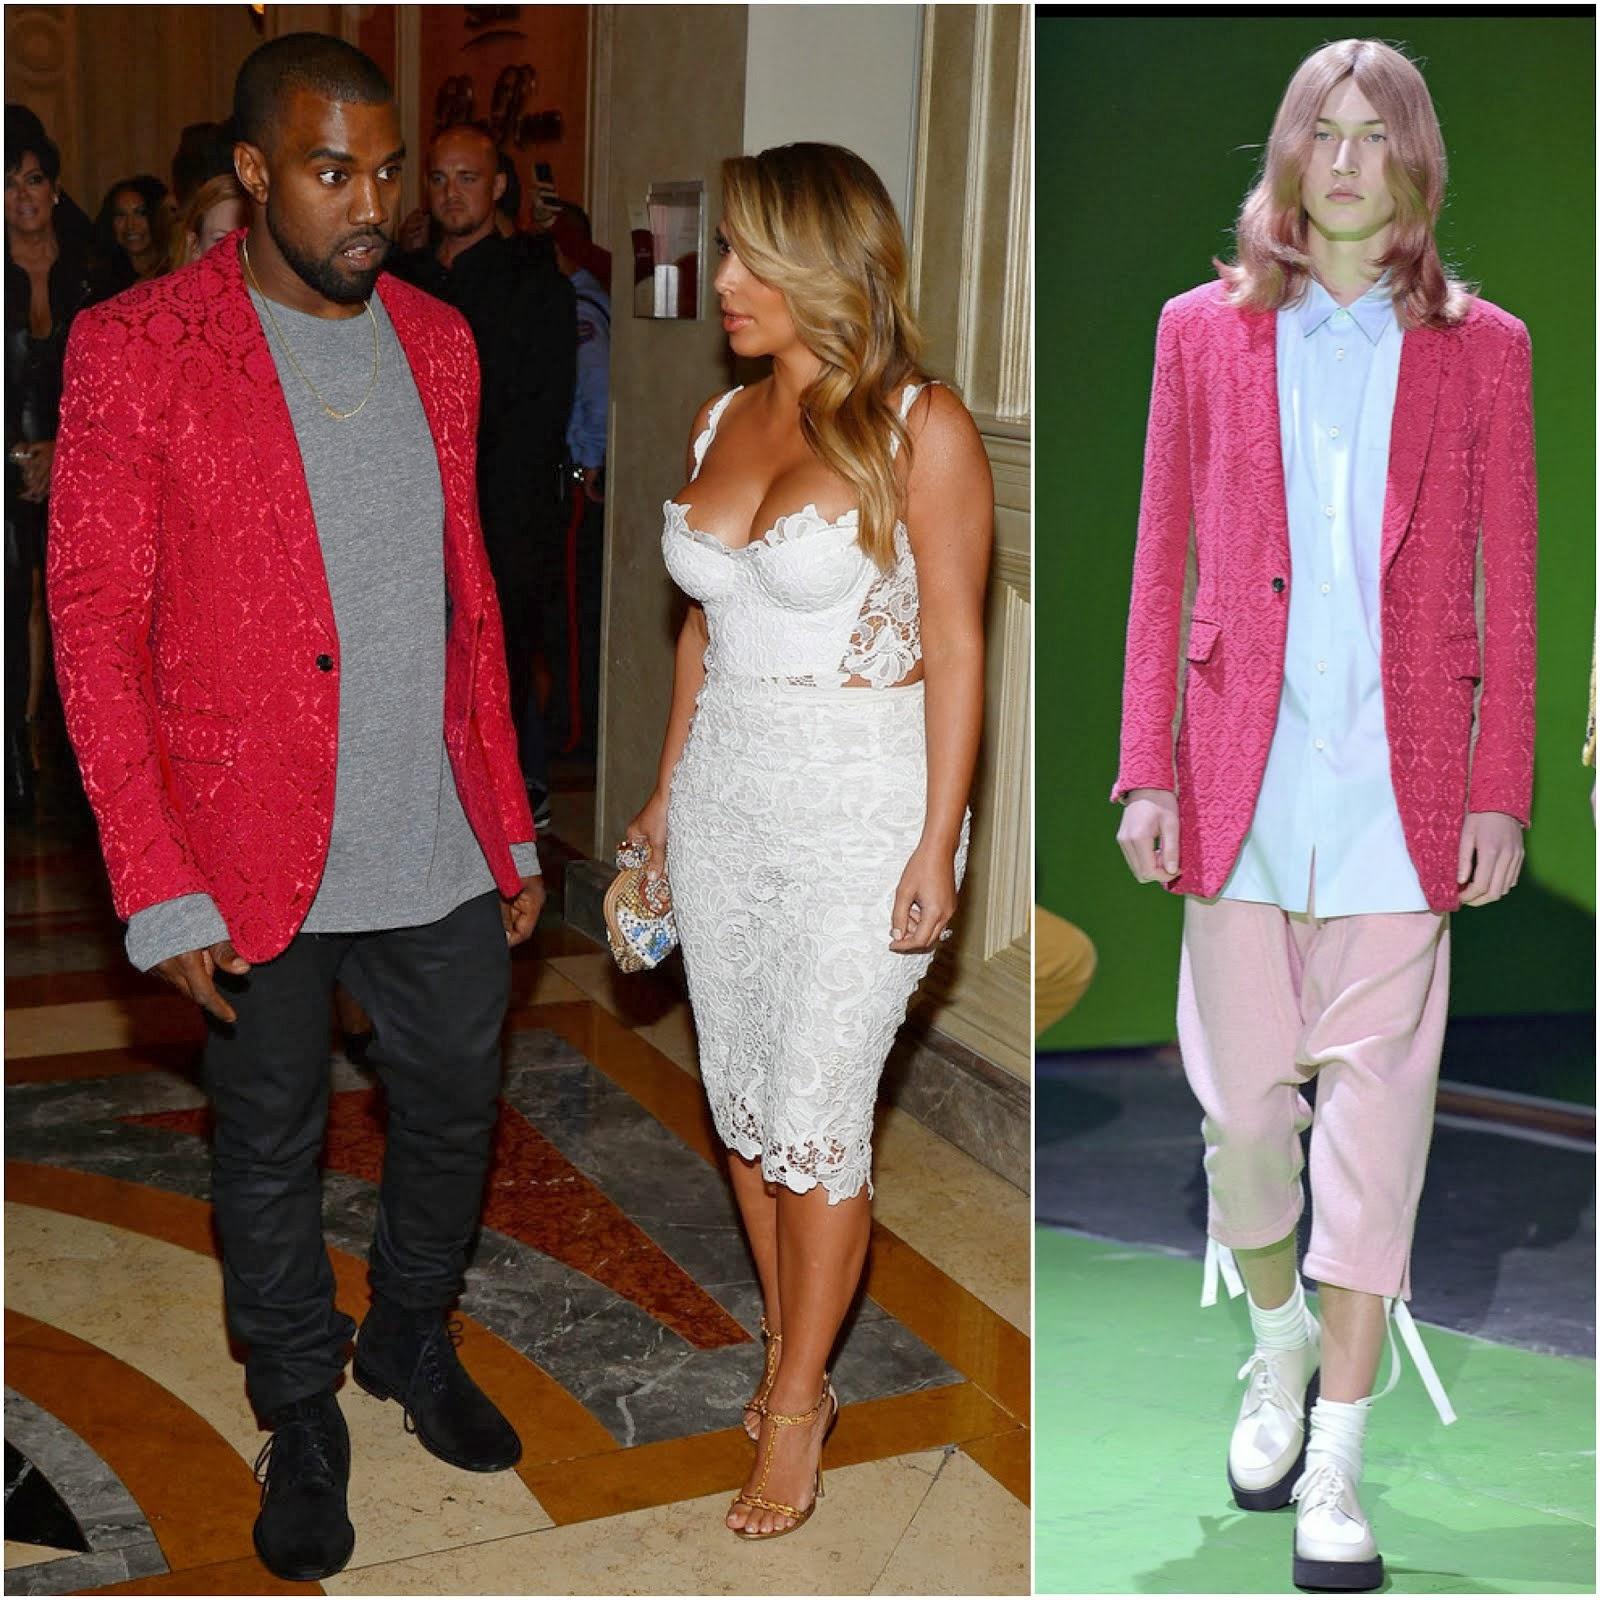 00O00 Menswear Blog: Kanye West in Comme des Garçons brocade blazer - Tao Nightclub, Las Vegas